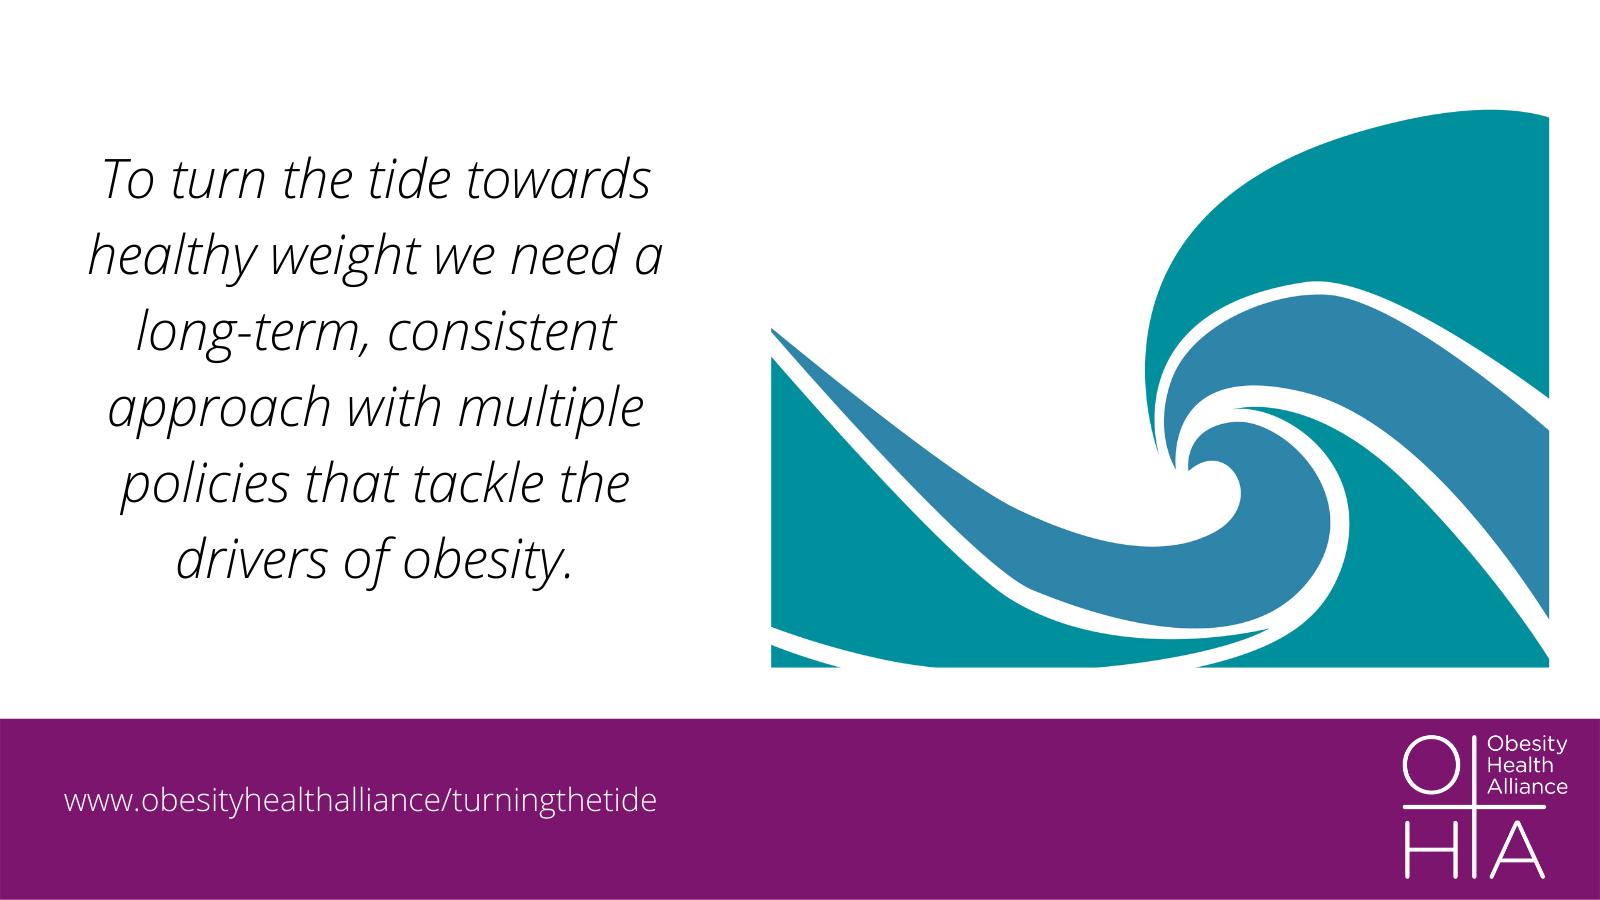 Credit: Obesity Health Alliance